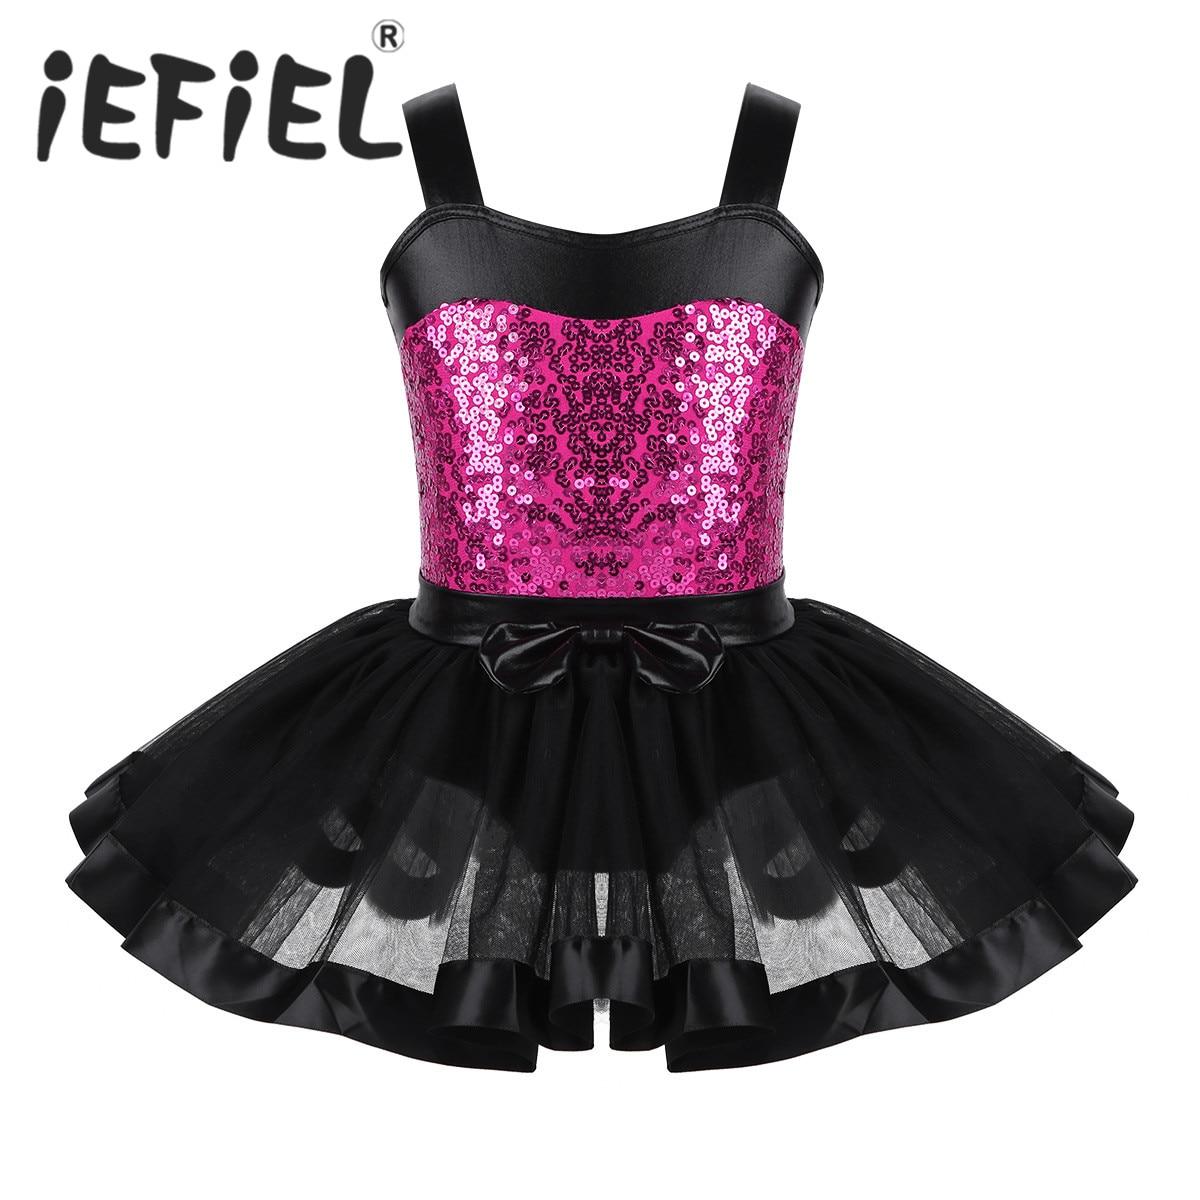 Sequins Kids Girls Sleeveless Fancy Party Ballet Dance Gymnastics Leotard Tutu Dress Christmas Costumes Dancewear Tulle Dress